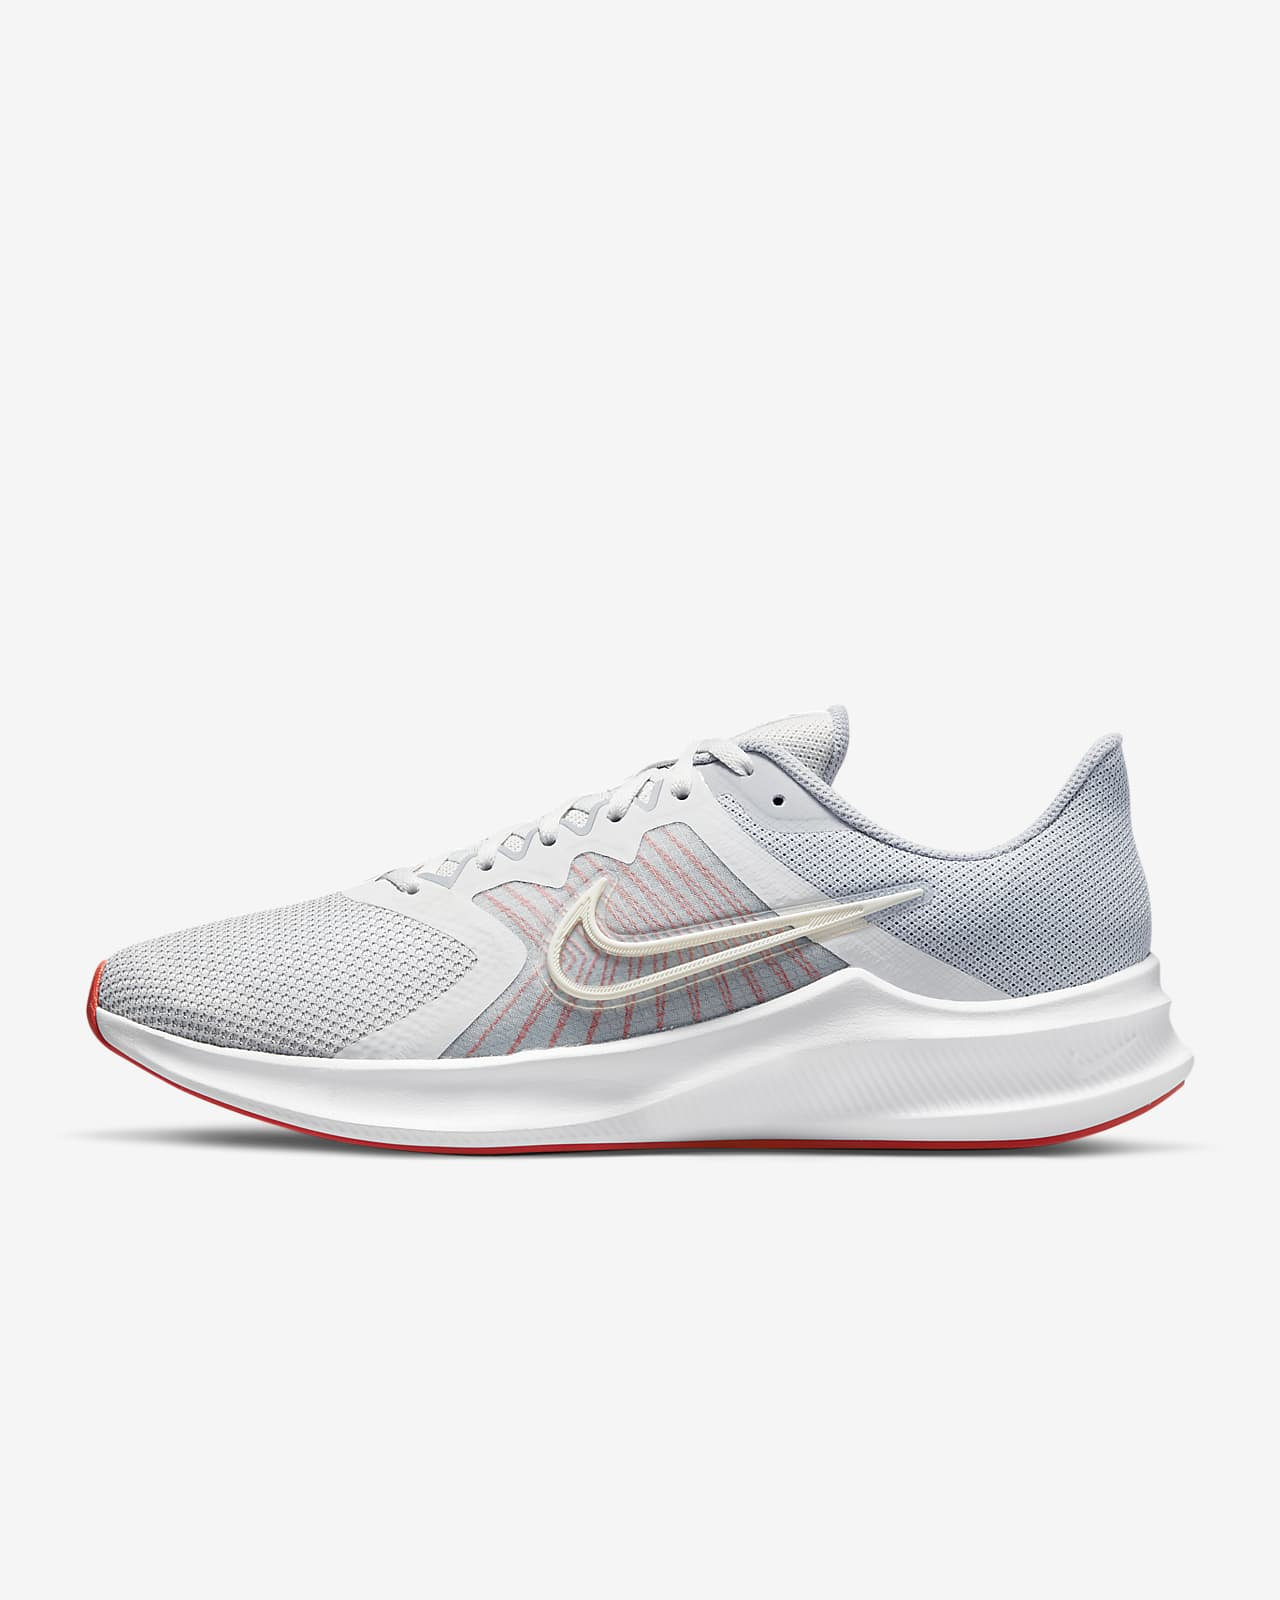 Мужские кроссовки для бега по шоссе Nike Downshifter 11